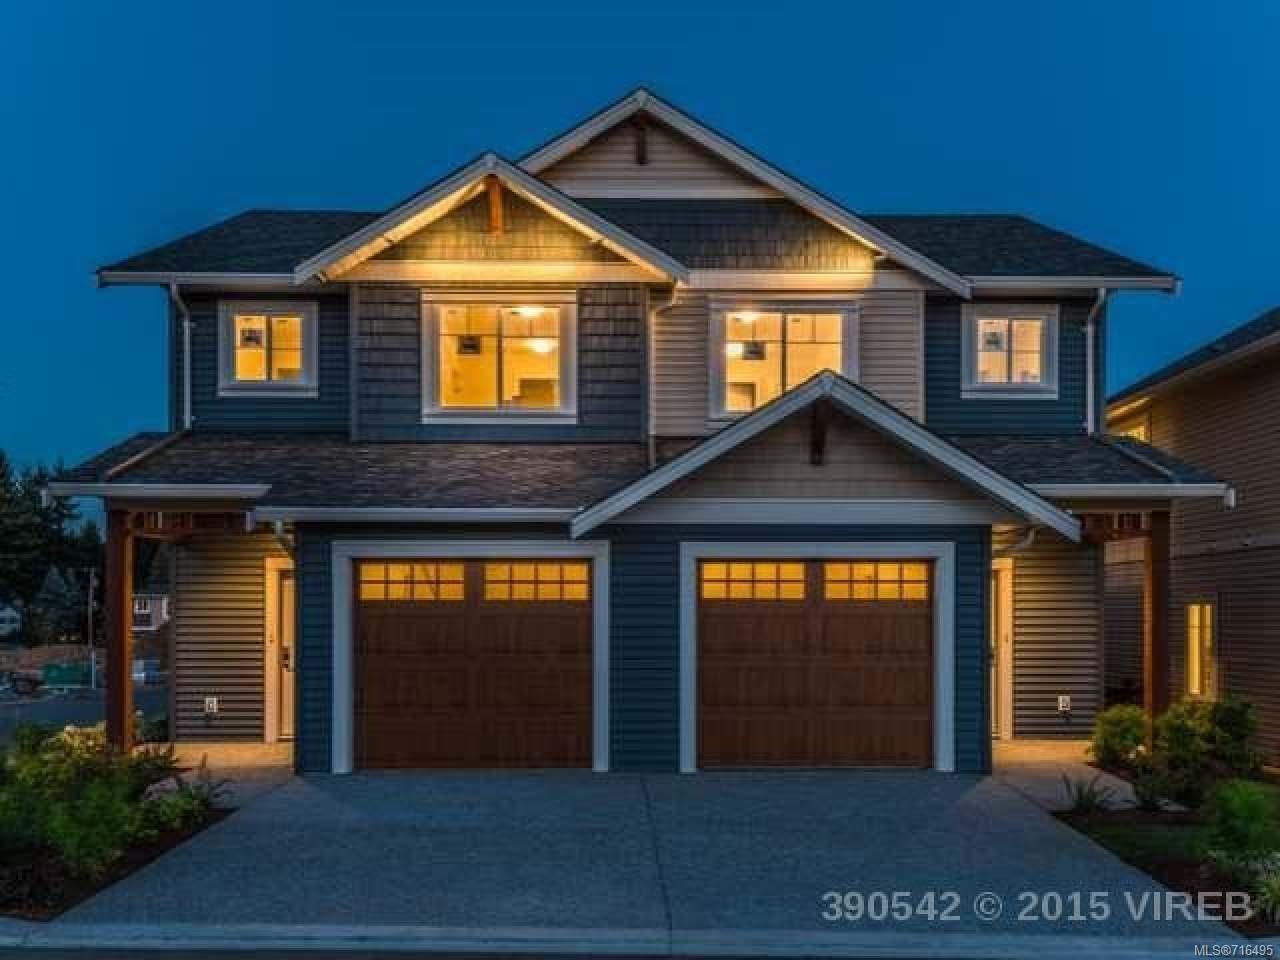 Main Photo: 156 1720 Dufferin Cres in NANAIMO: Na Central Nanaimo Row/Townhouse for sale (Nanaimo)  : MLS®# 716495